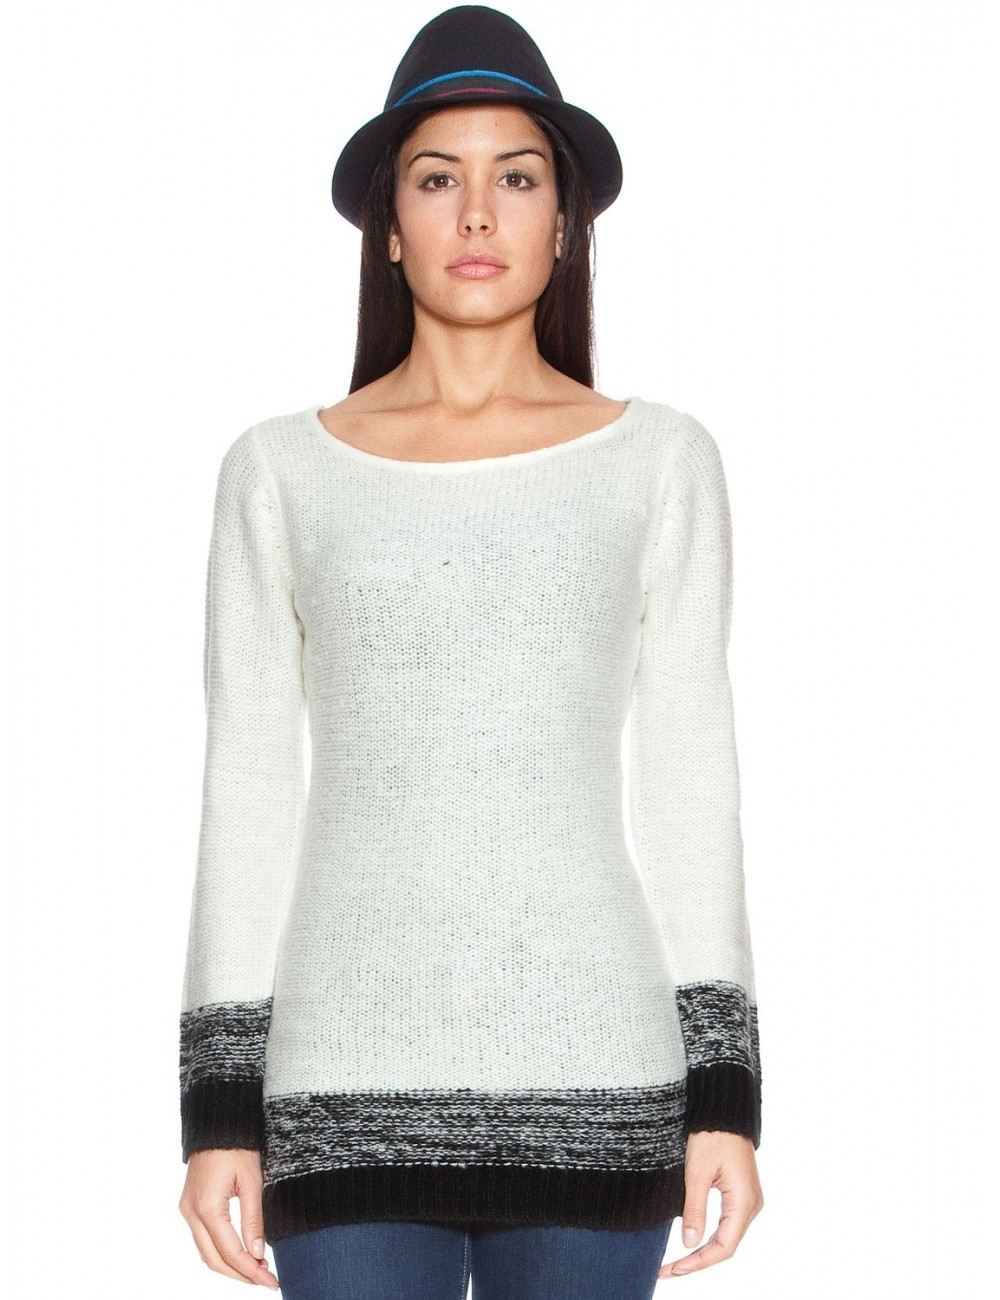 Pulover femei alb cu bordura neagra L - XL